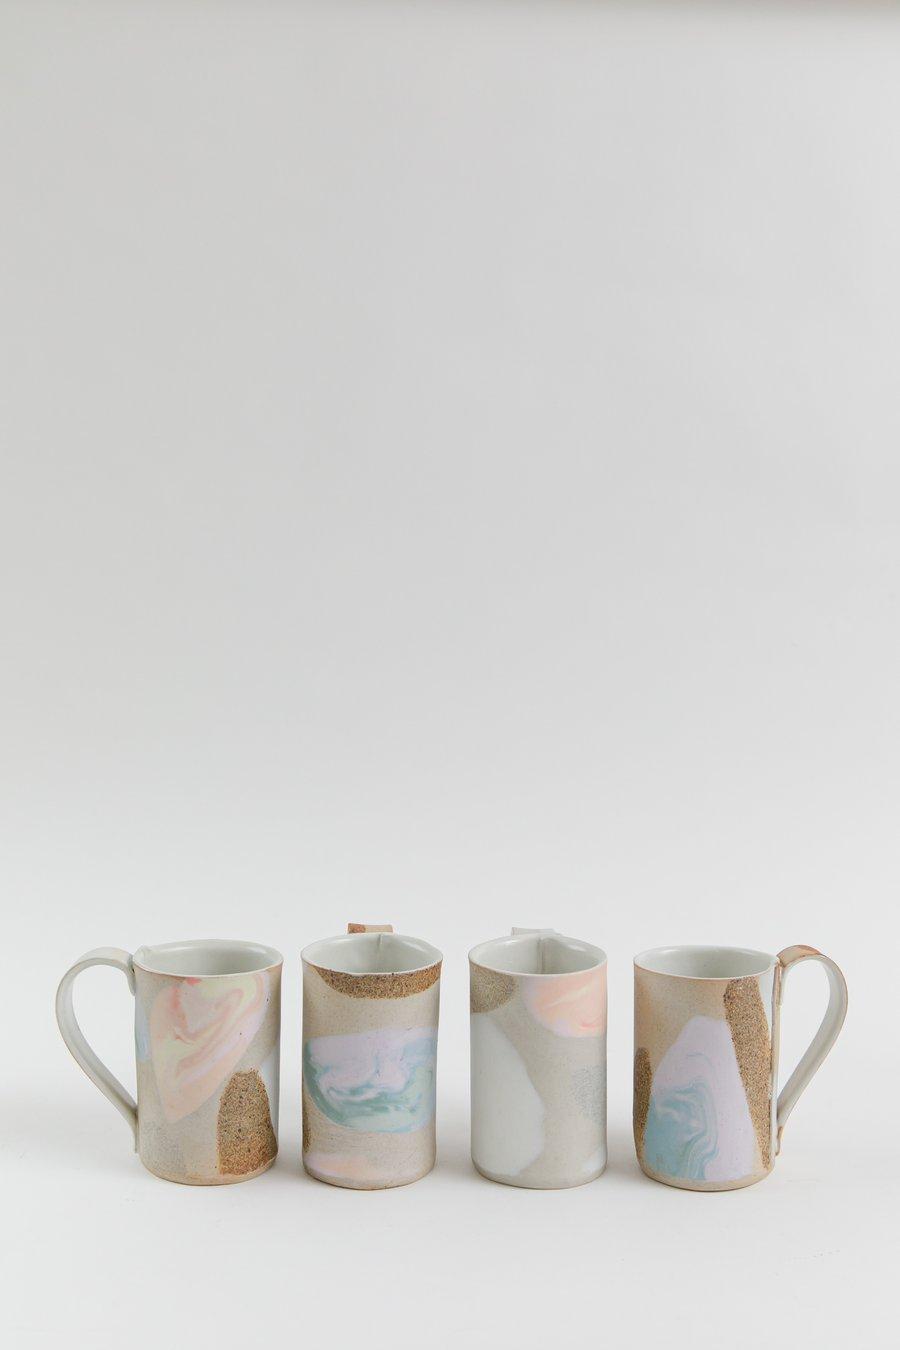 Image of Tangerine Lavender Dream - Tall Porcelain Inlay Handled Mug